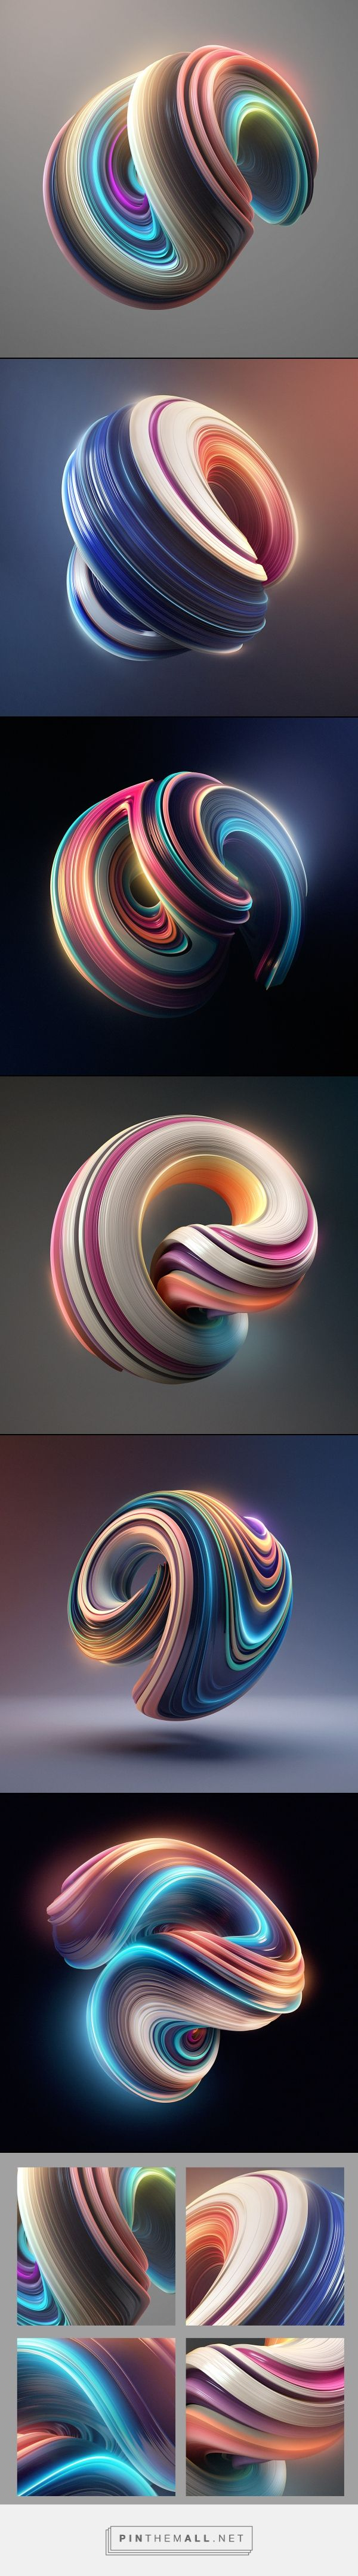 arcūs on Behance -https://www.behance.net/gallery/34766315/arcus